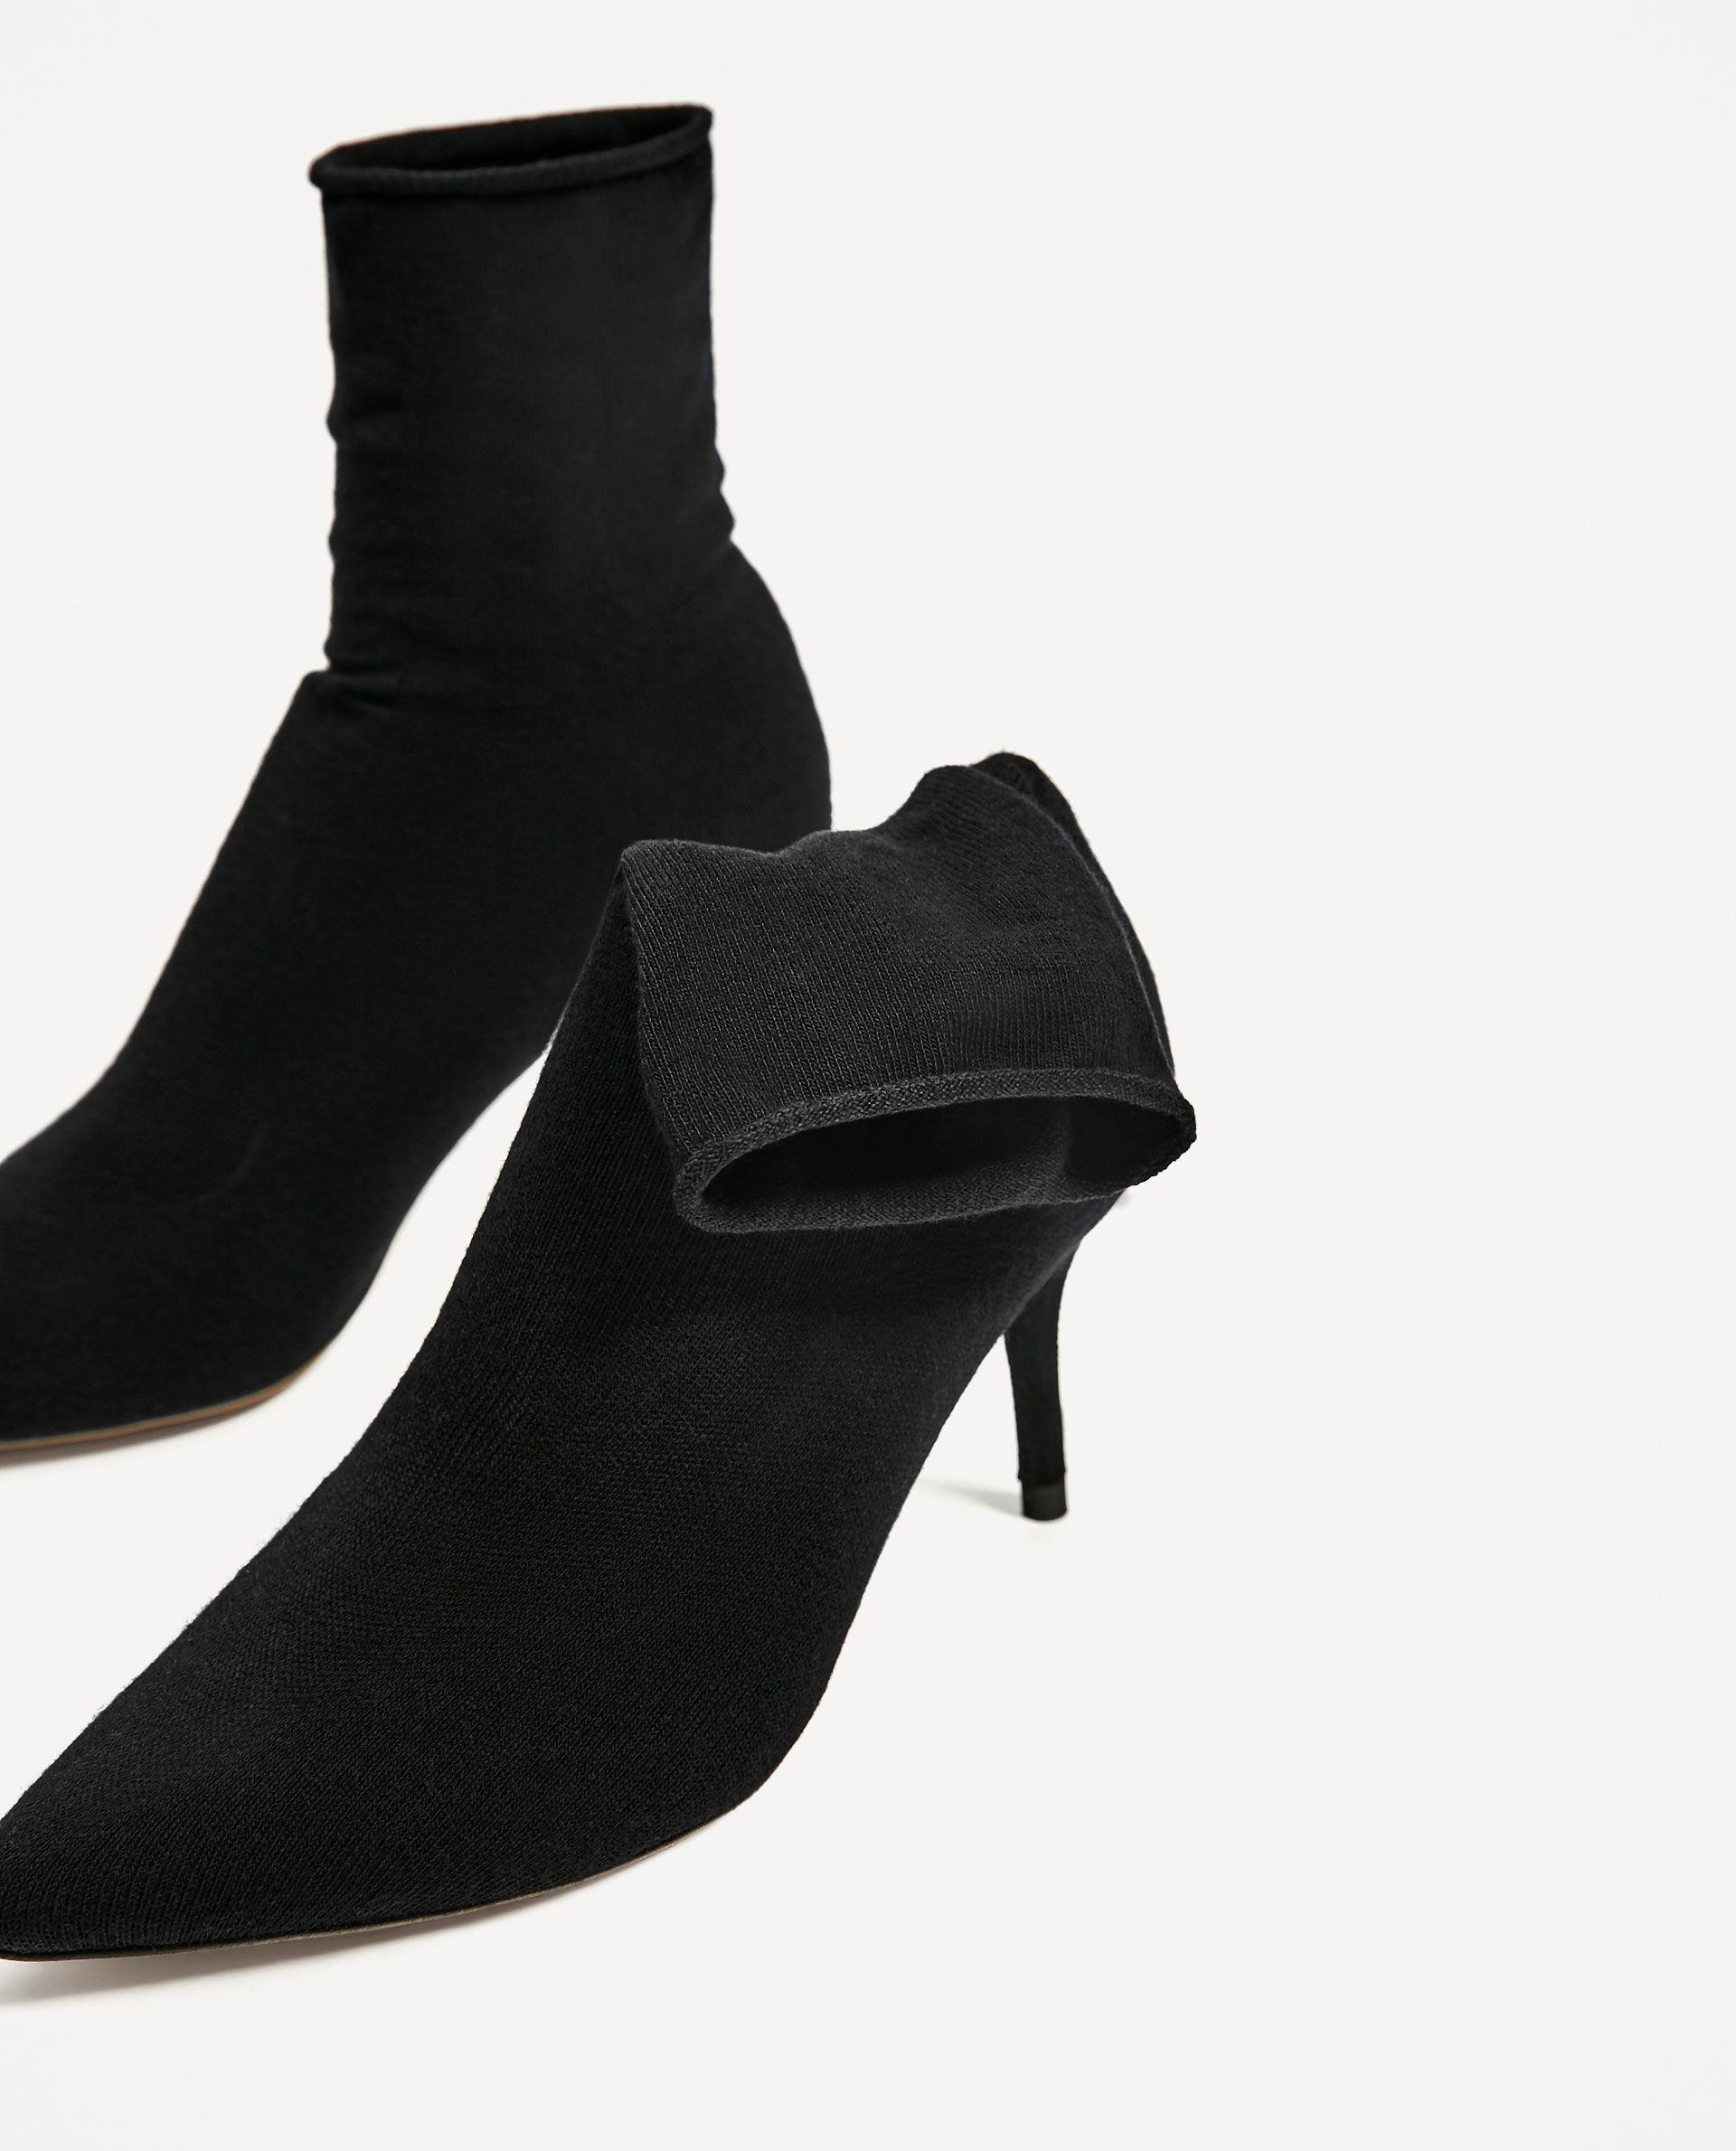 https://www.zara.com/es/es/mujer/zapatos/modern-romance/bot%C3%ADn-tac%C3%B3n-calcet%C3%ADn-c358013p4521592.html